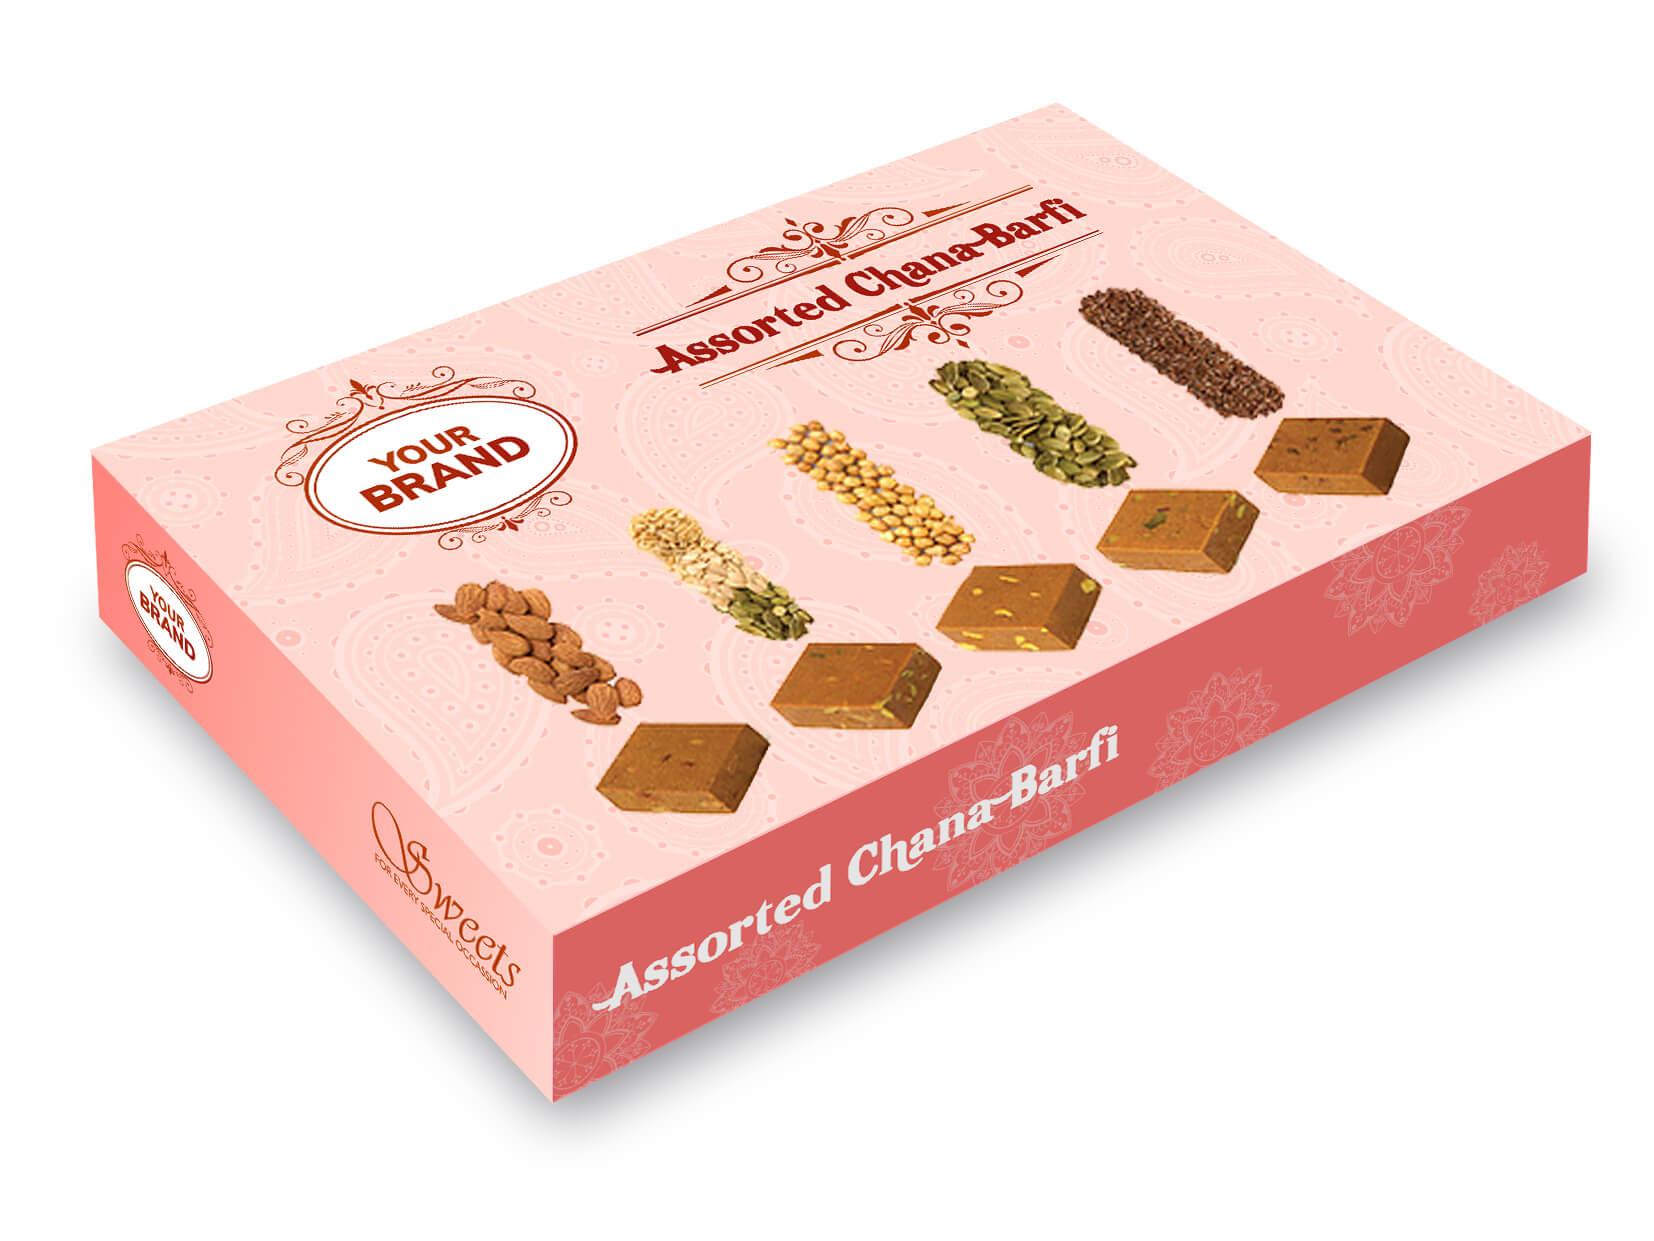 Assorted Chana Barfi Box - Your Brand